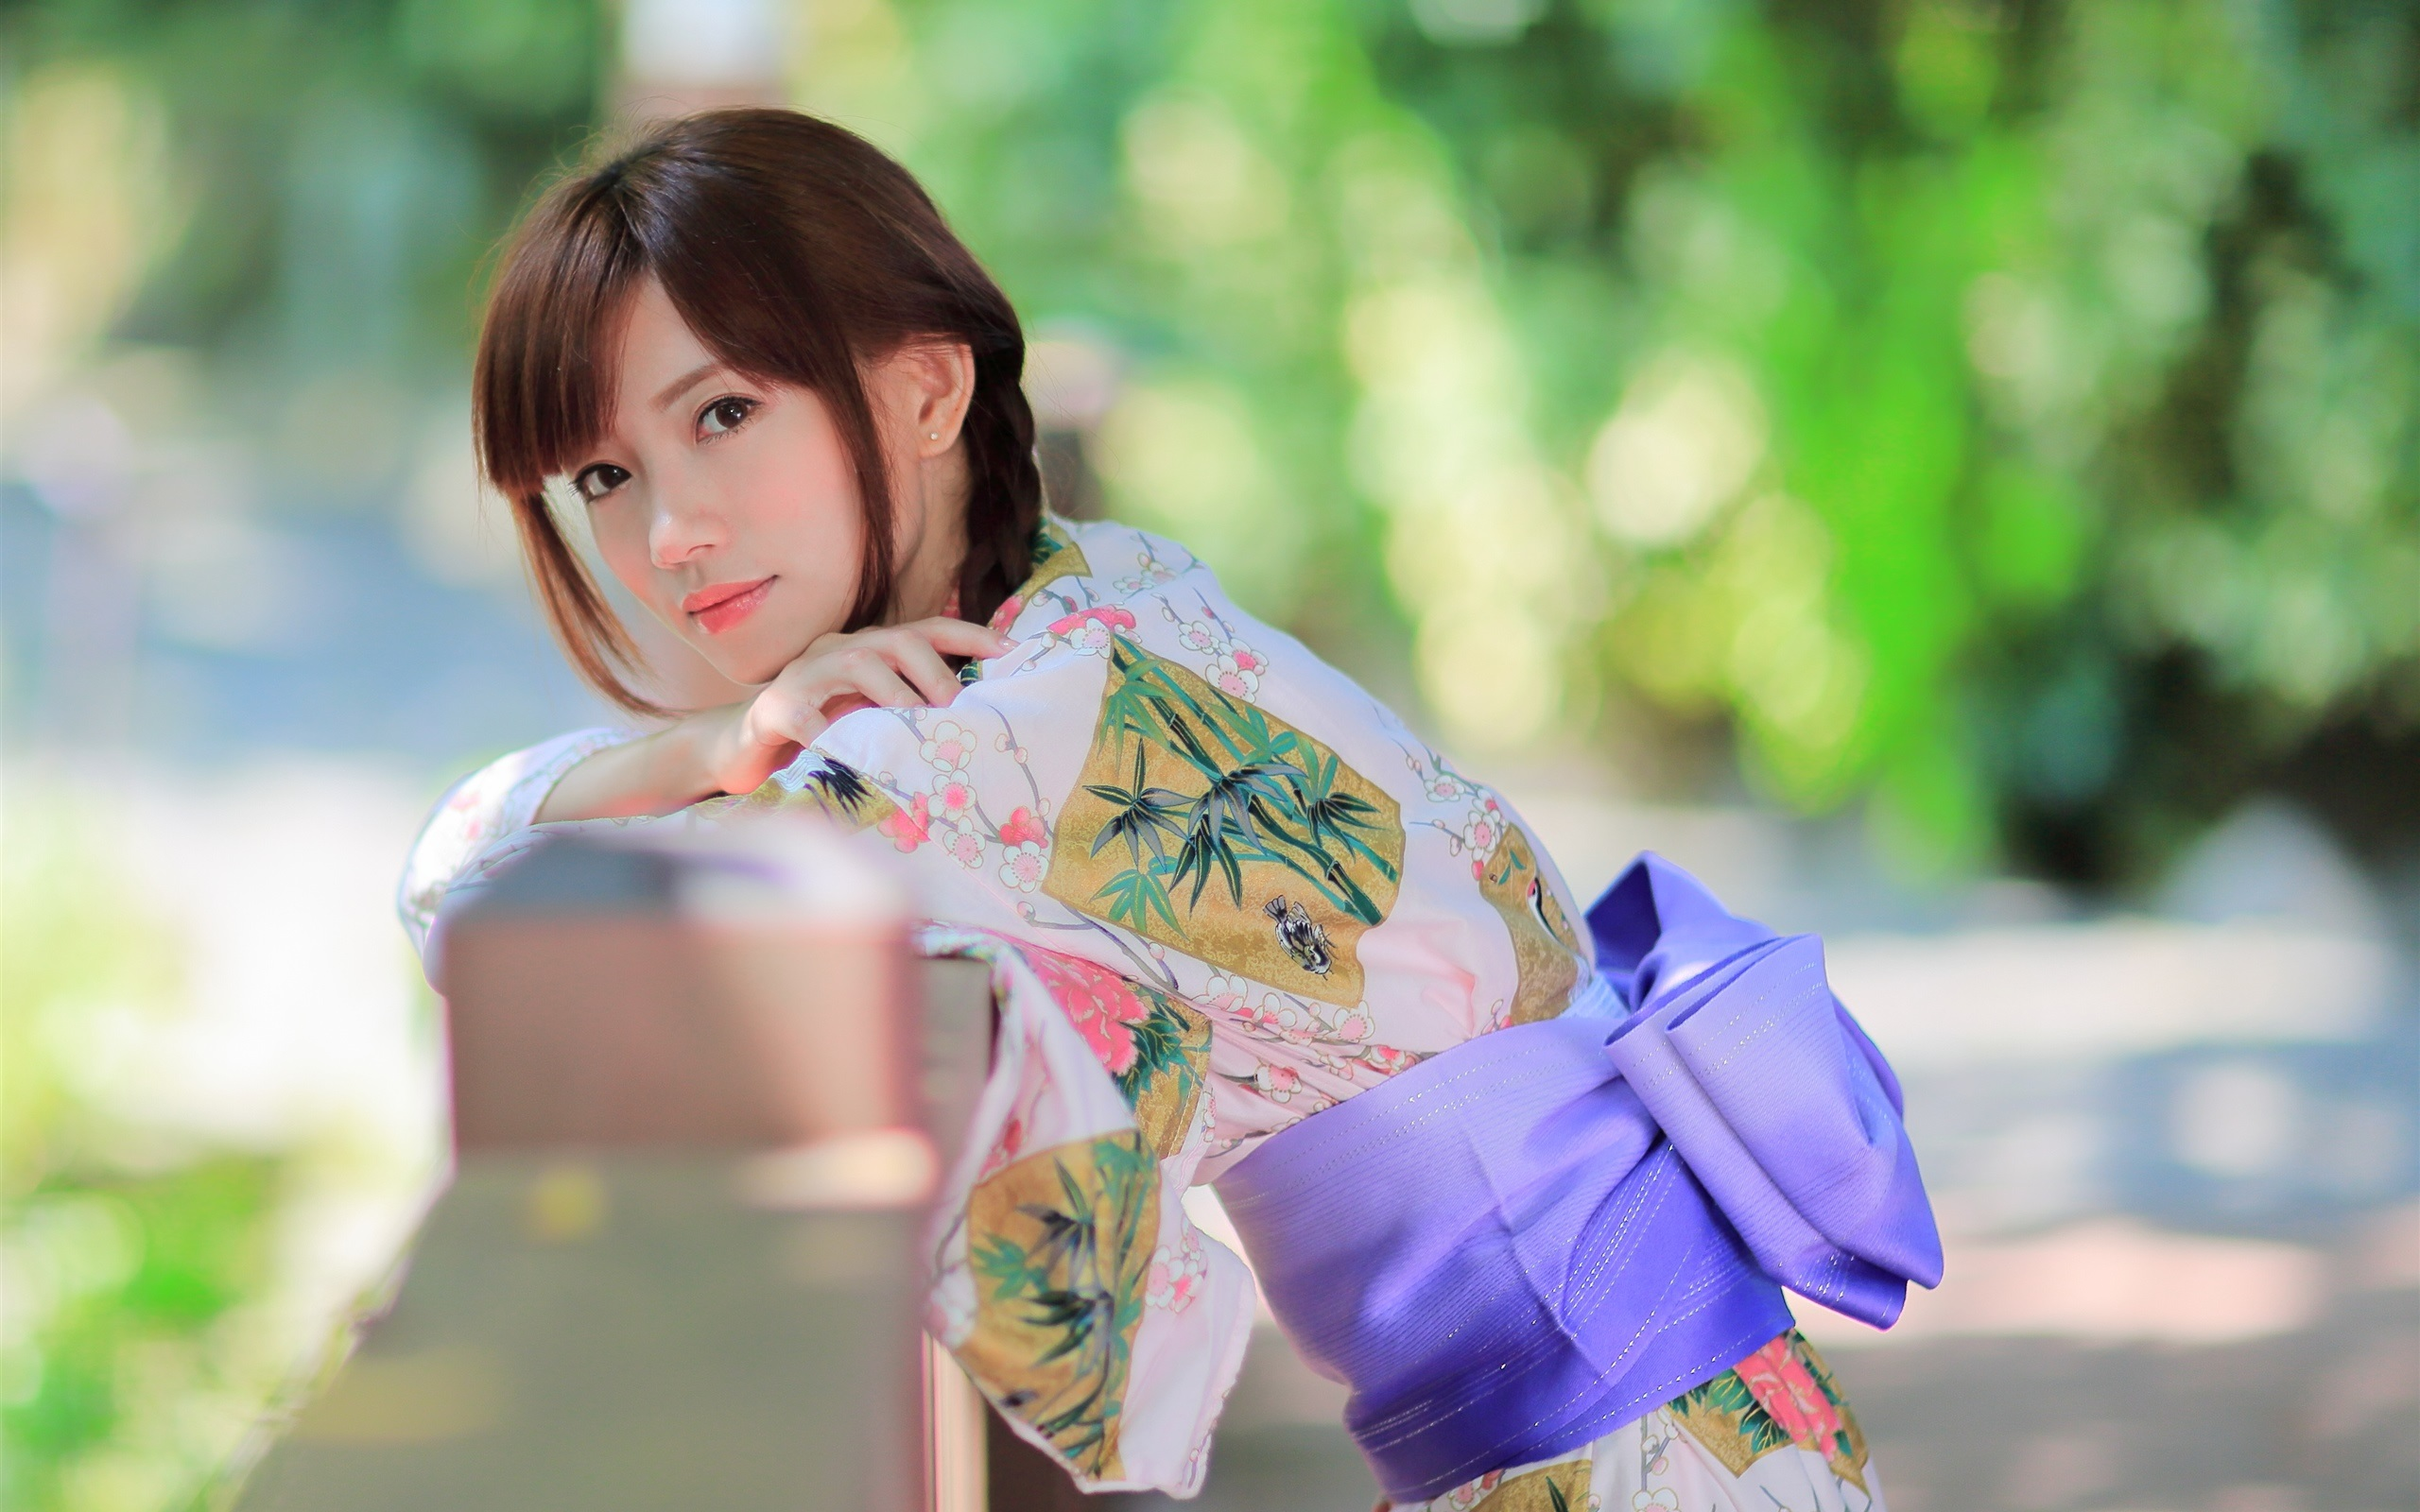 beautiful japanese girl, kimono, summer 750x1334 iphone 8/7/6/6s